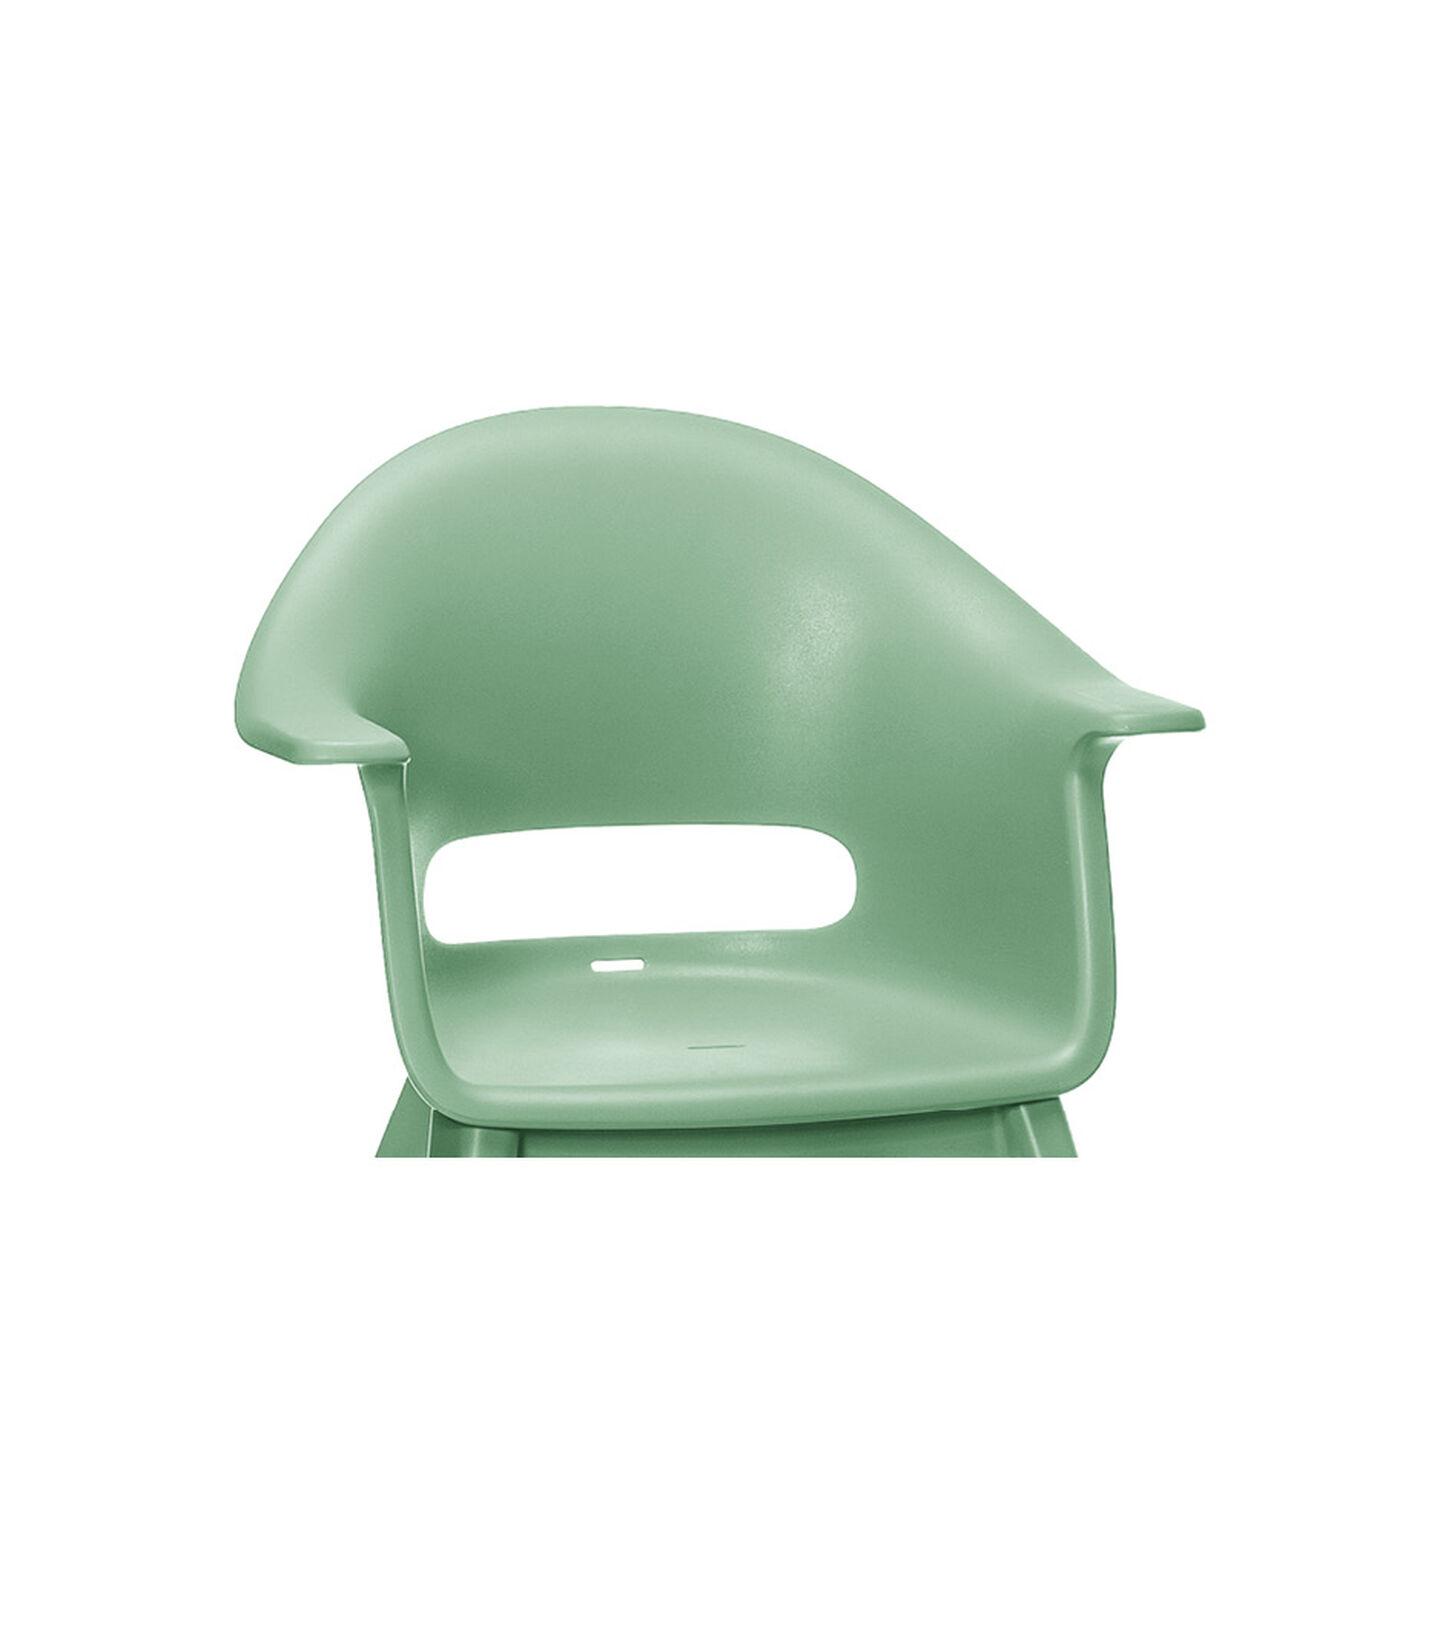 Stokke® Clikk™ Seggiolino Clover Green, Verde Trifoglio, mainview view 1